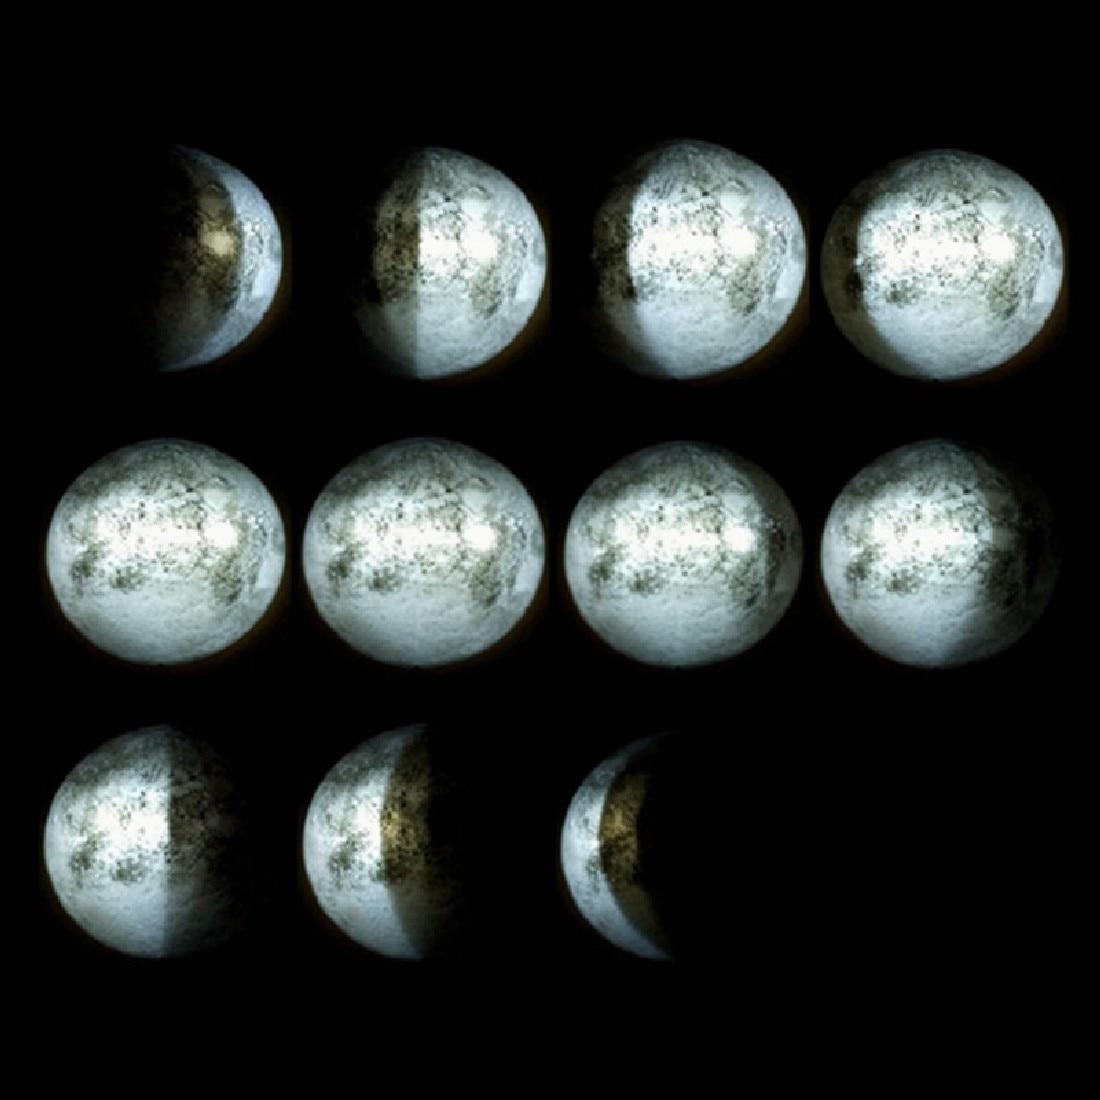 Niesamowity pilot LED Healing Moon Wall Ceiling Night Lamp Kids Gifts - Lampki nocne - Zdjęcie 2